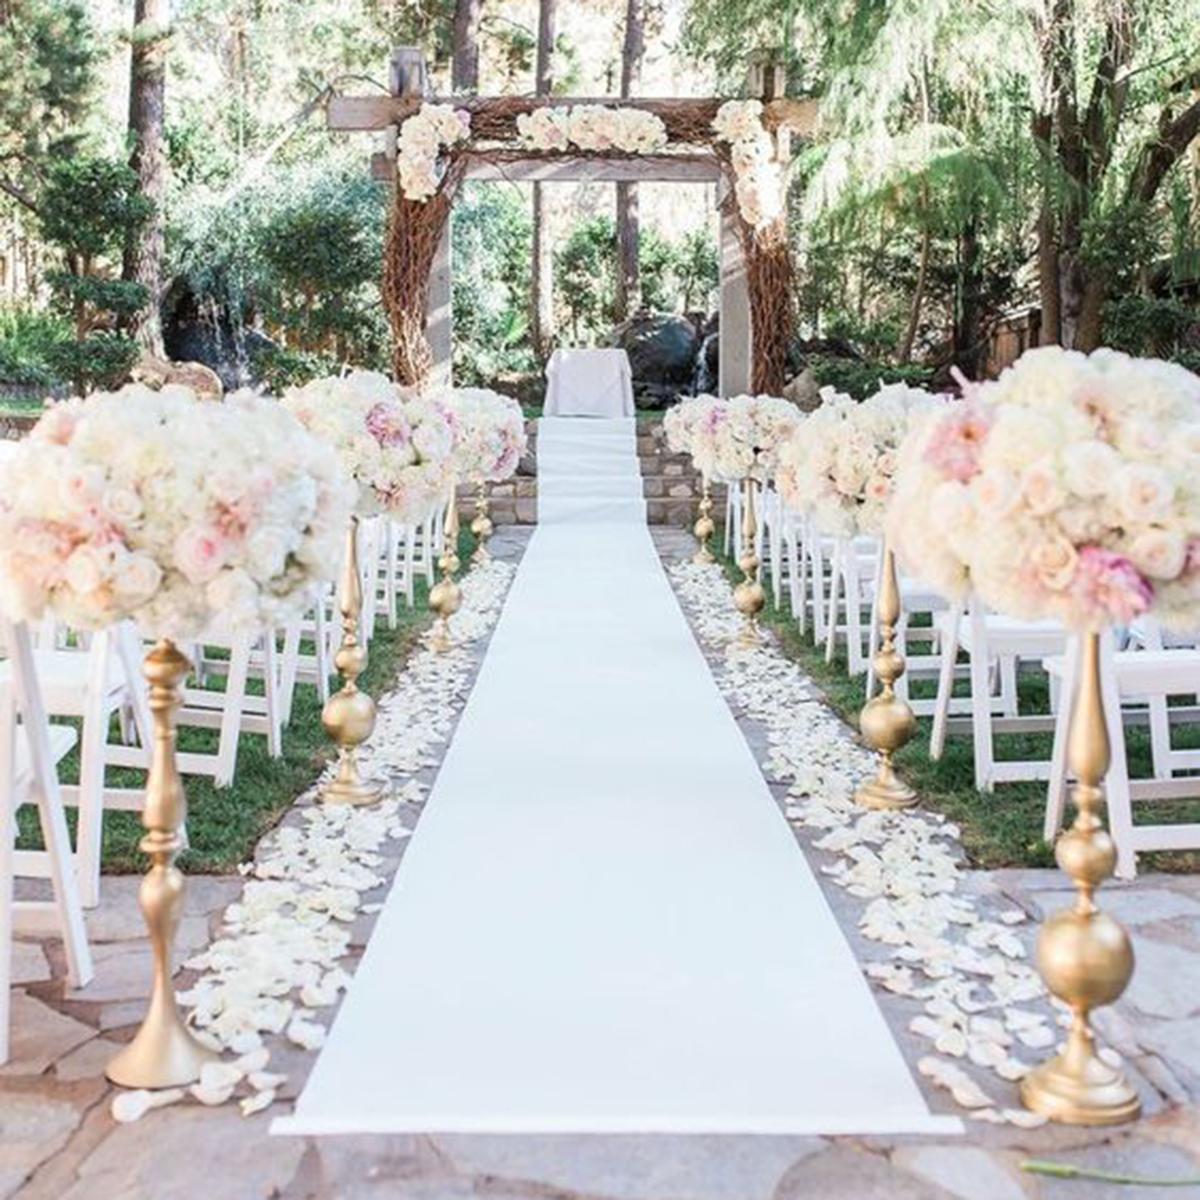 1 2m X 10m White Carpet Aisle Runner Wedding Party Event Decoration Mats Rugs